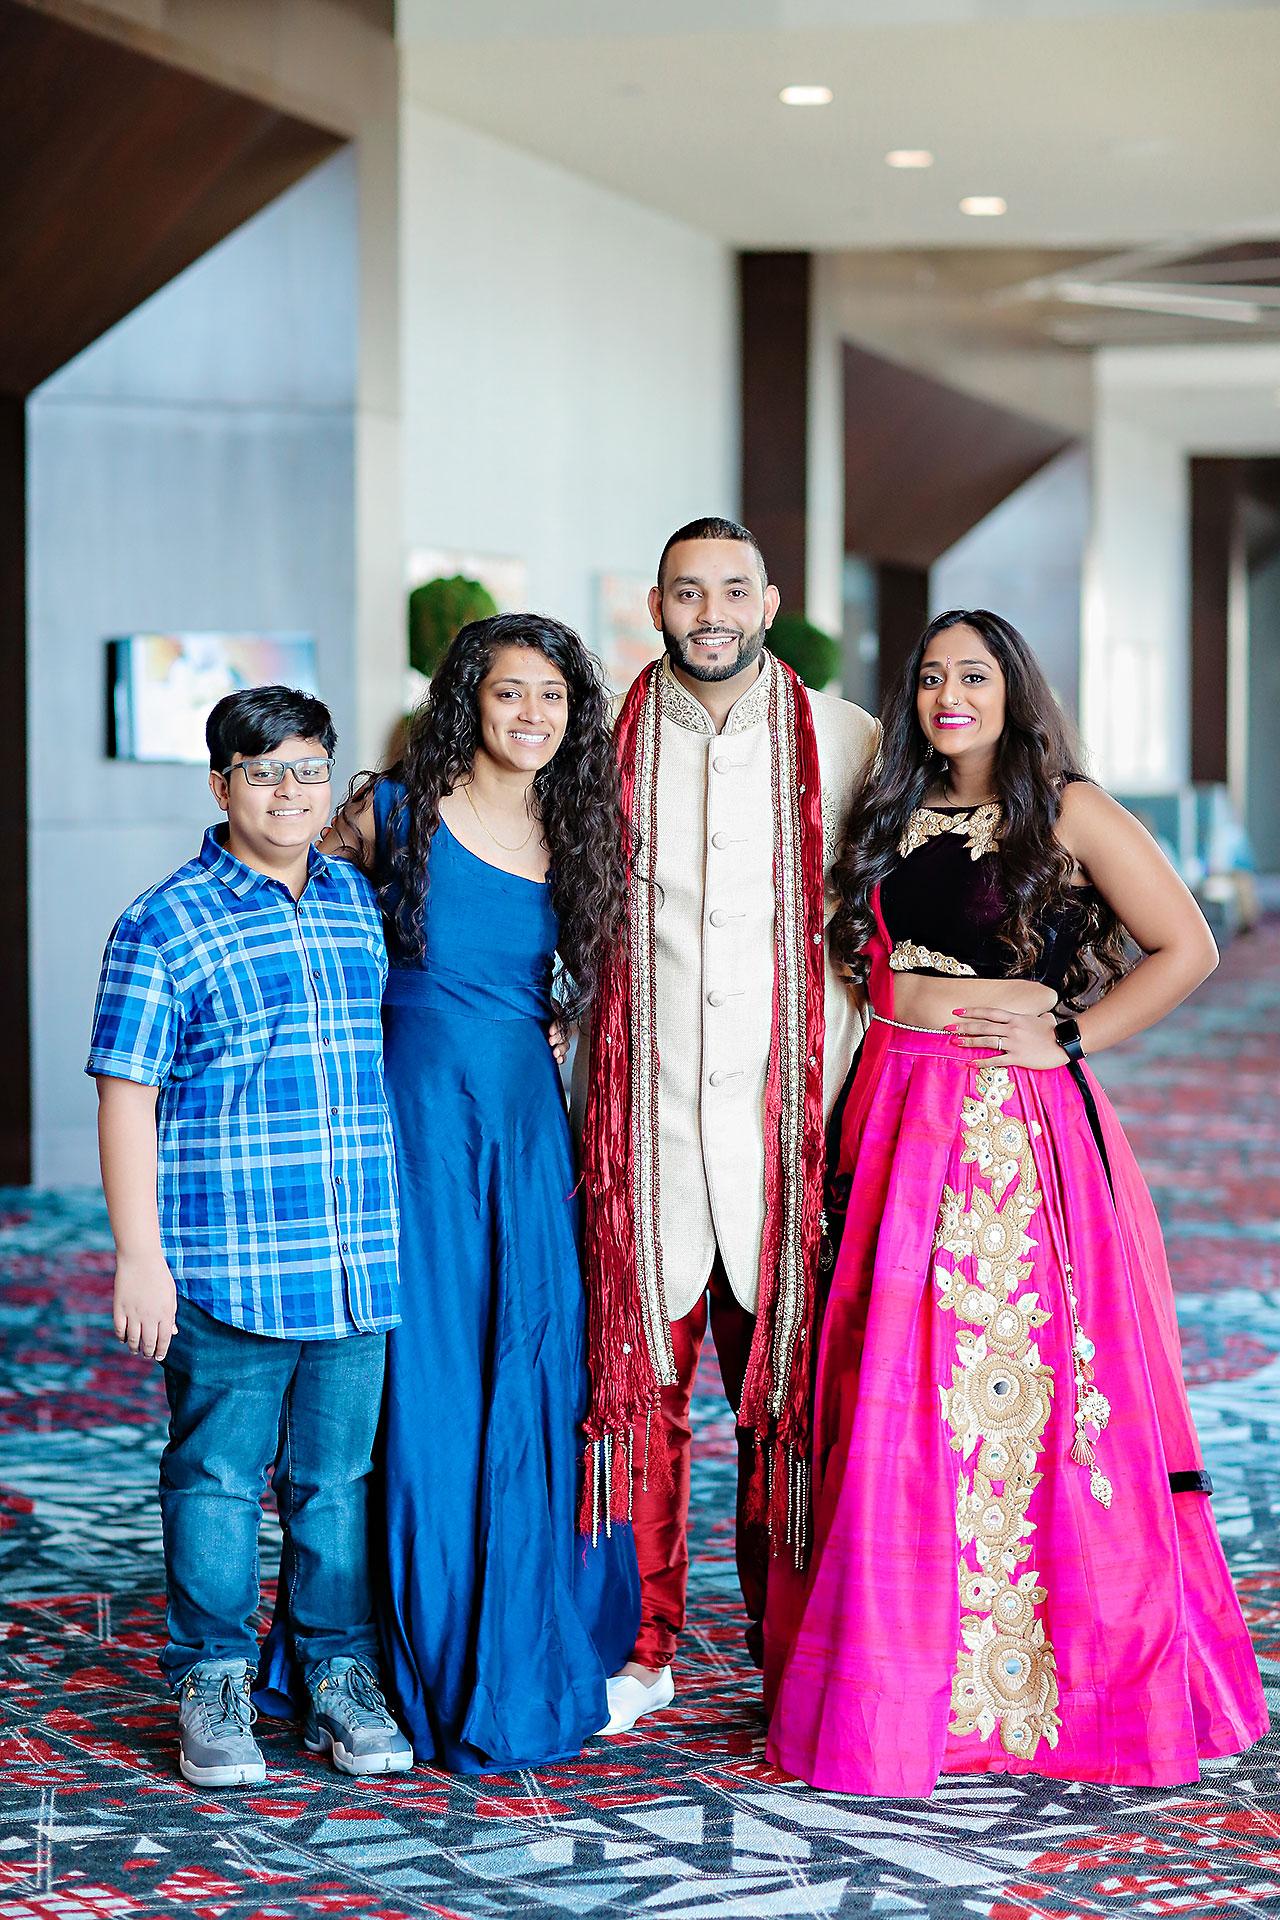 Neil Ganesh Pooja Embassy Suites Conference Center Noblesville 074